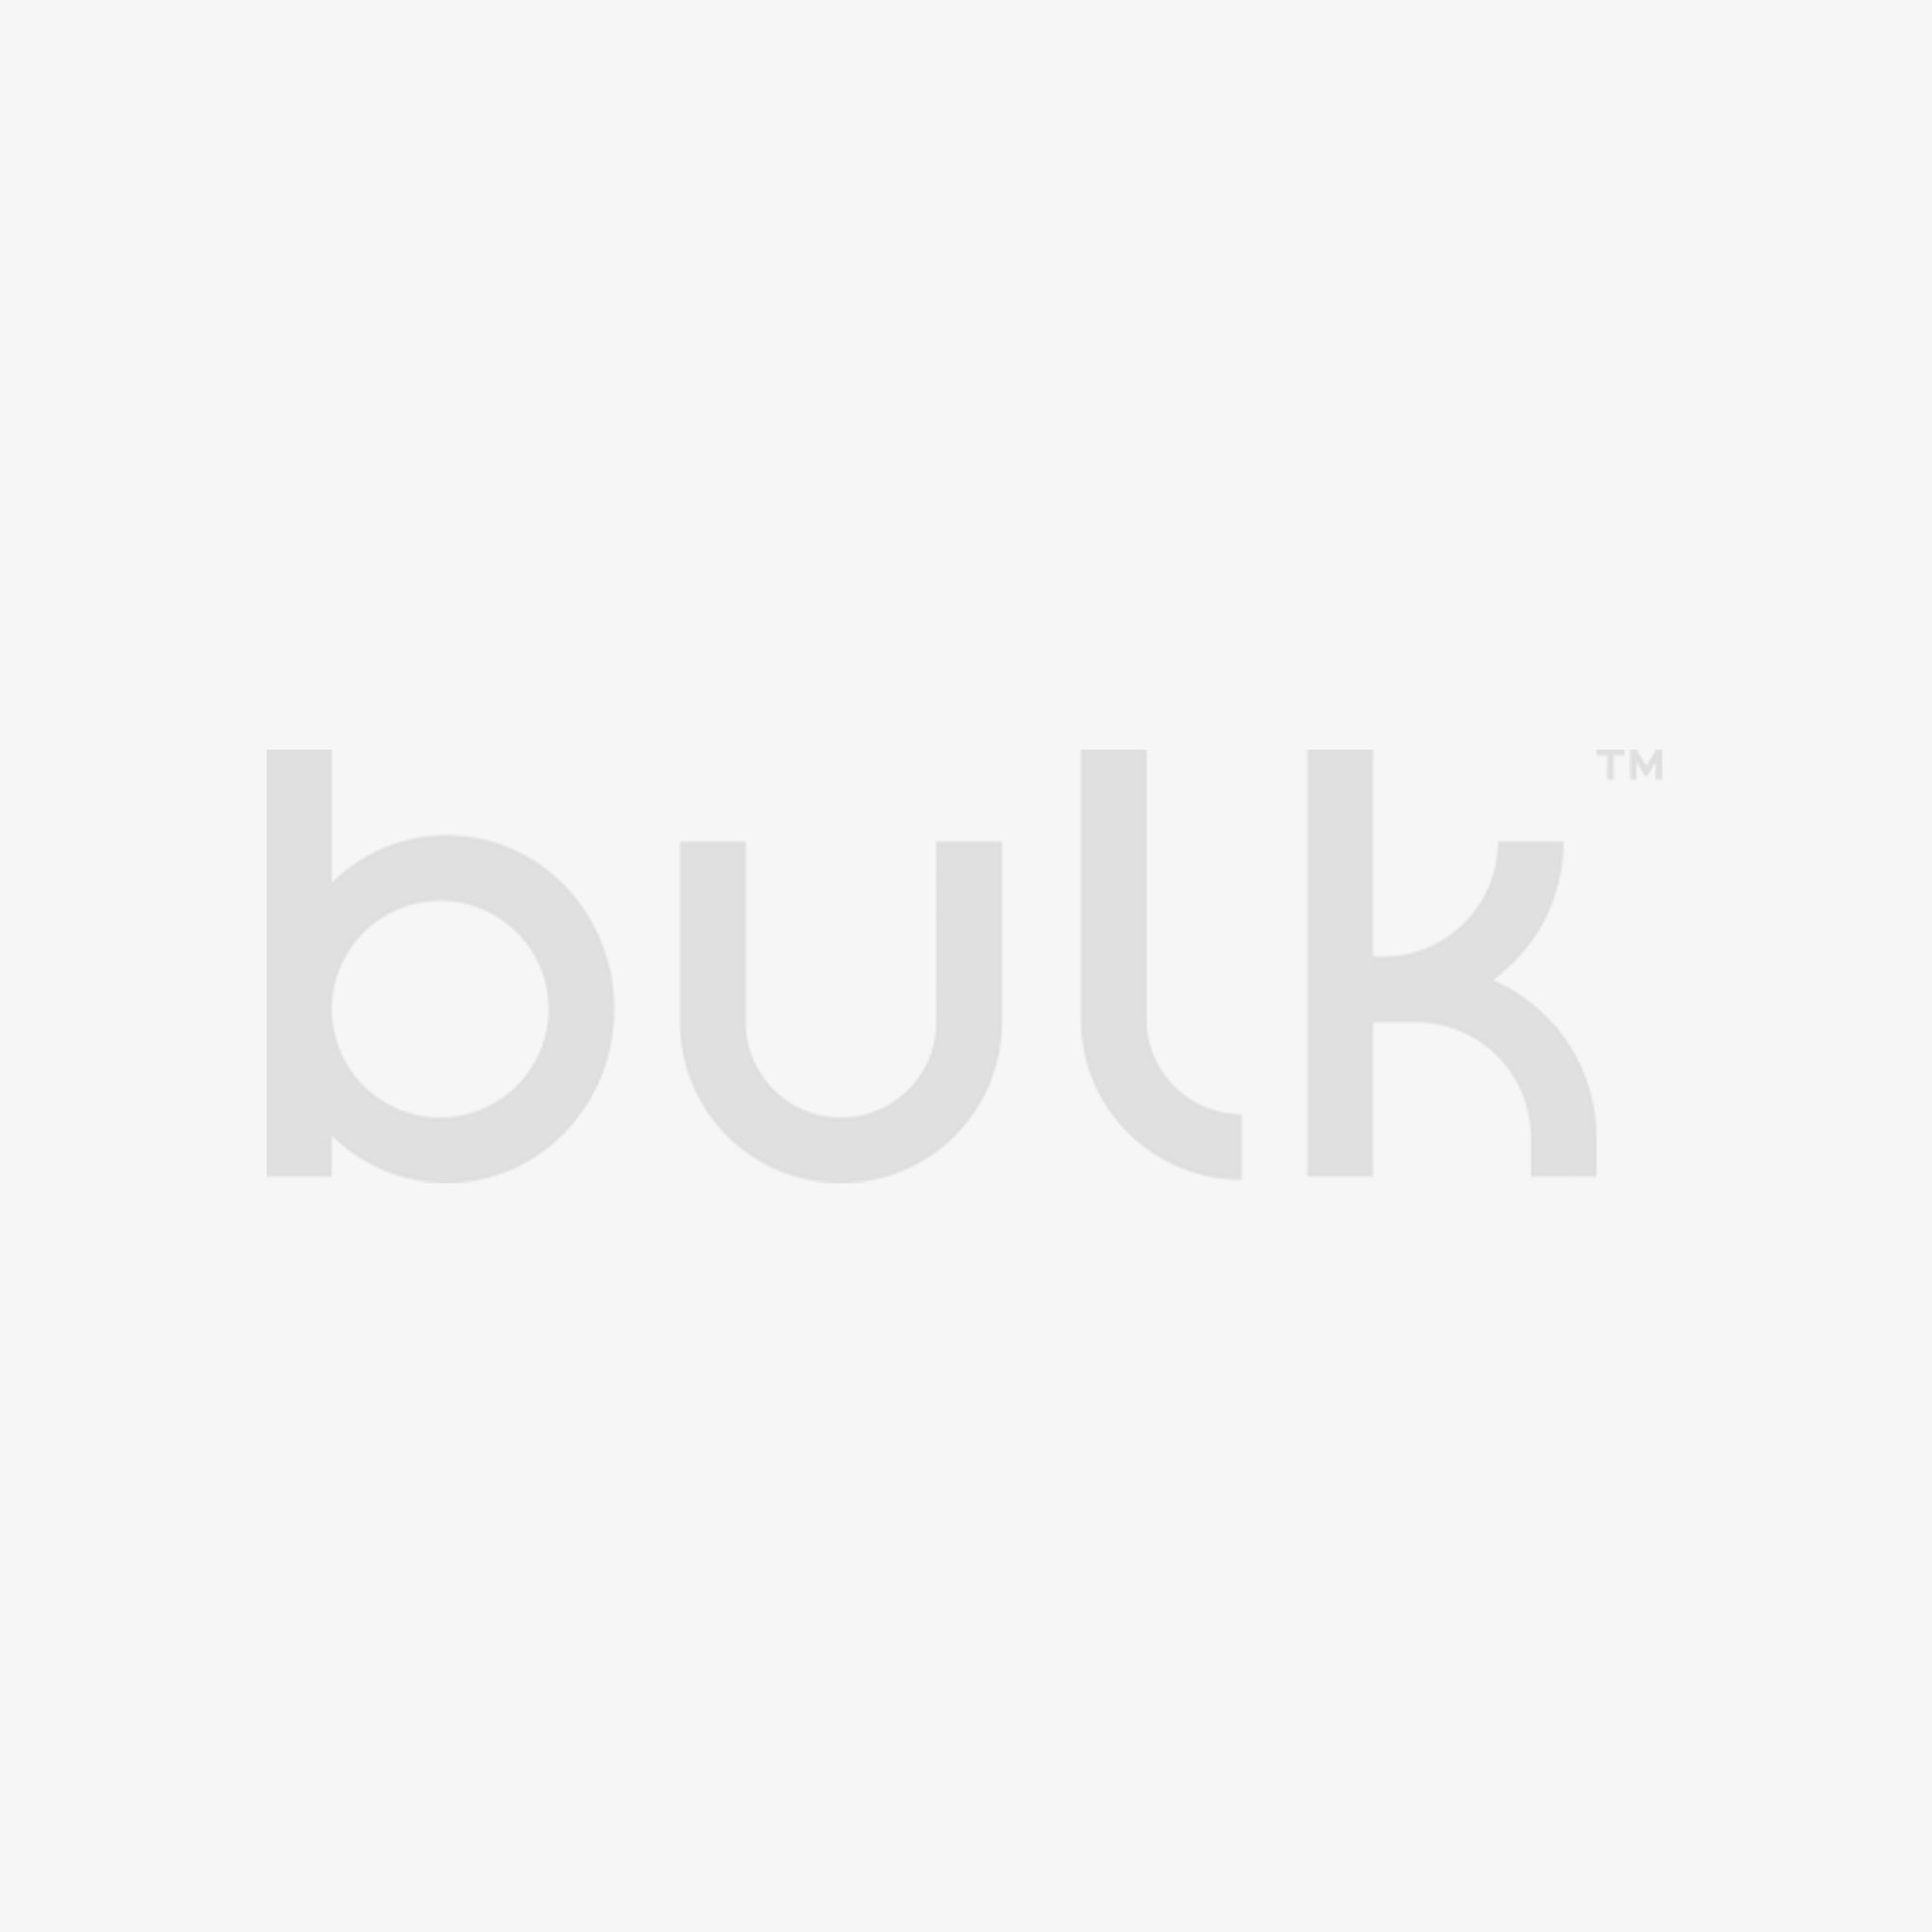 BULK POWDERS®️ Colete FIT